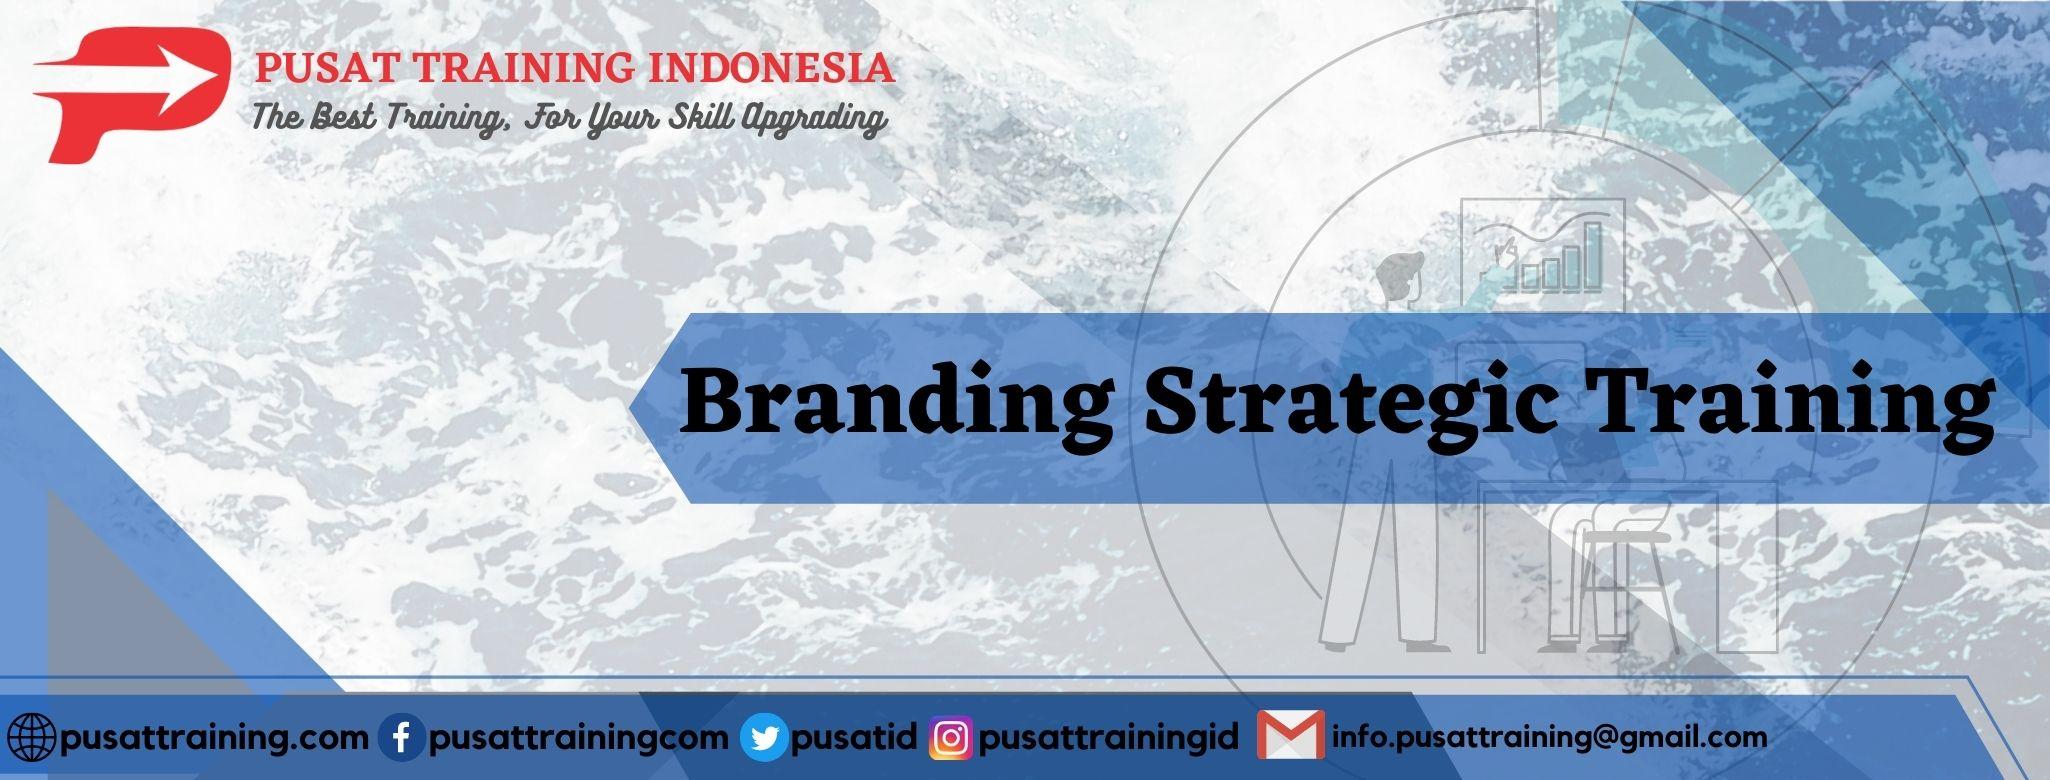 Branding-Strategic-Training